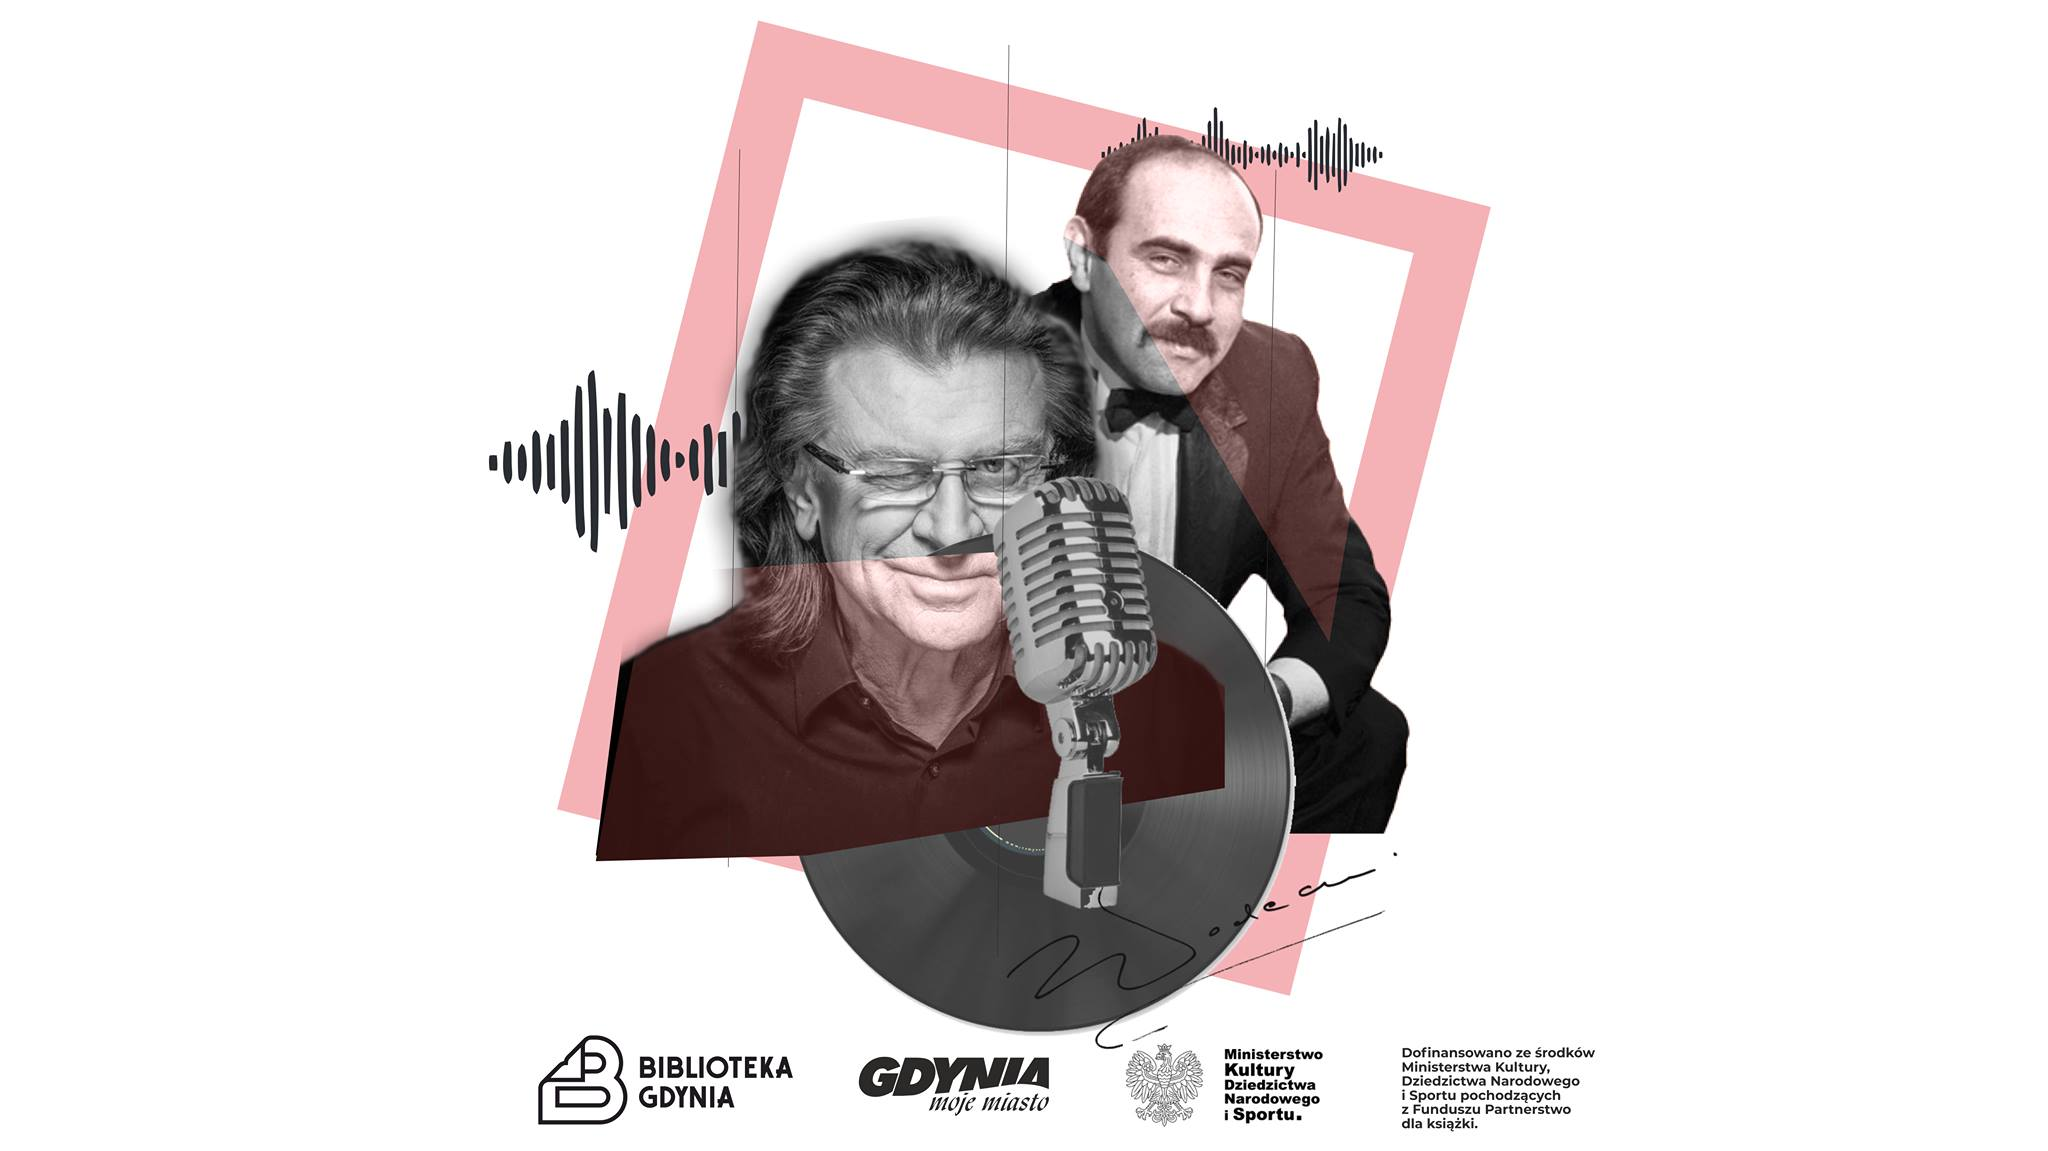 Wodecki i Zaucha. O biografiach i muzyce.